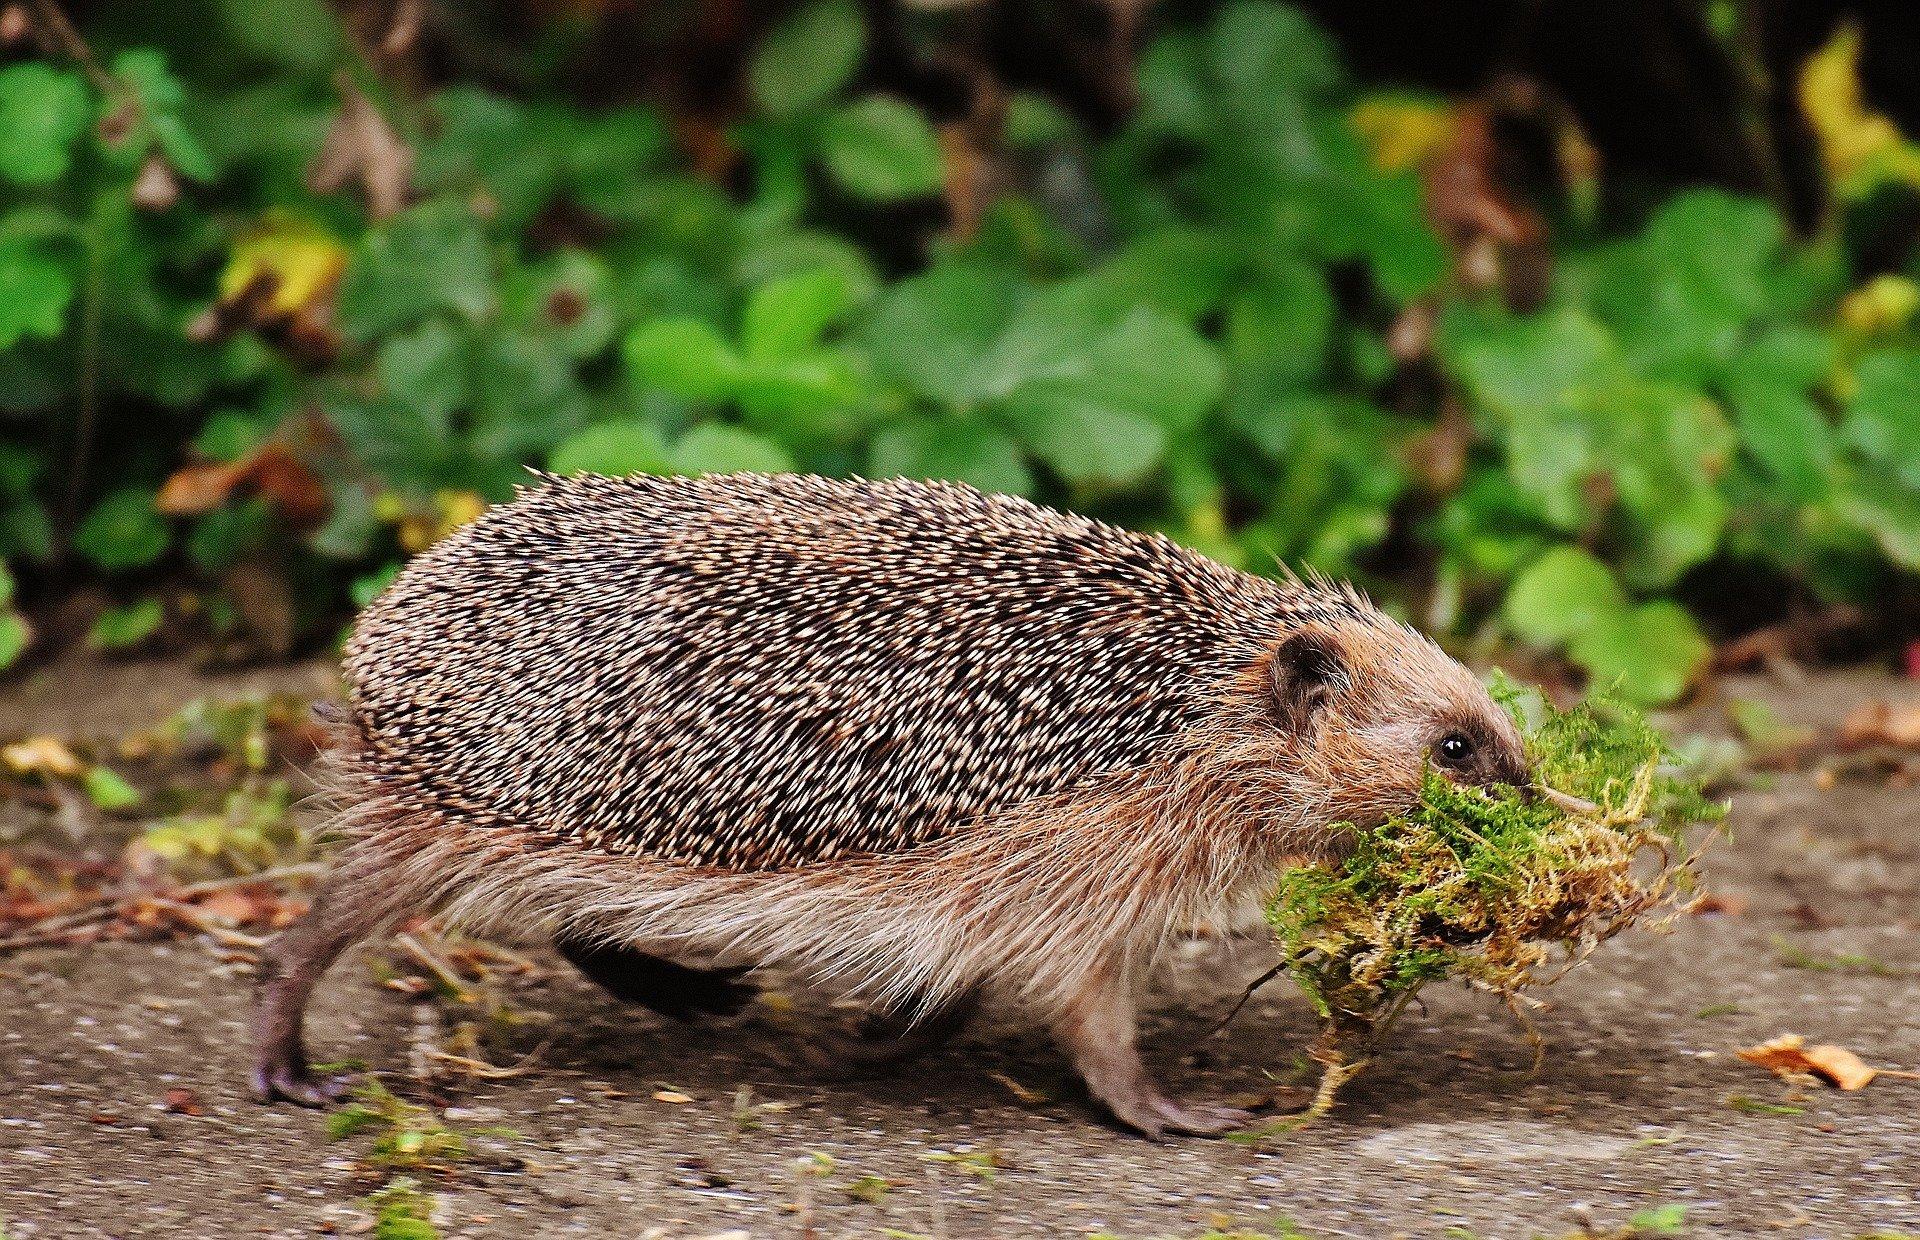 Welke dieren leven in je tuin